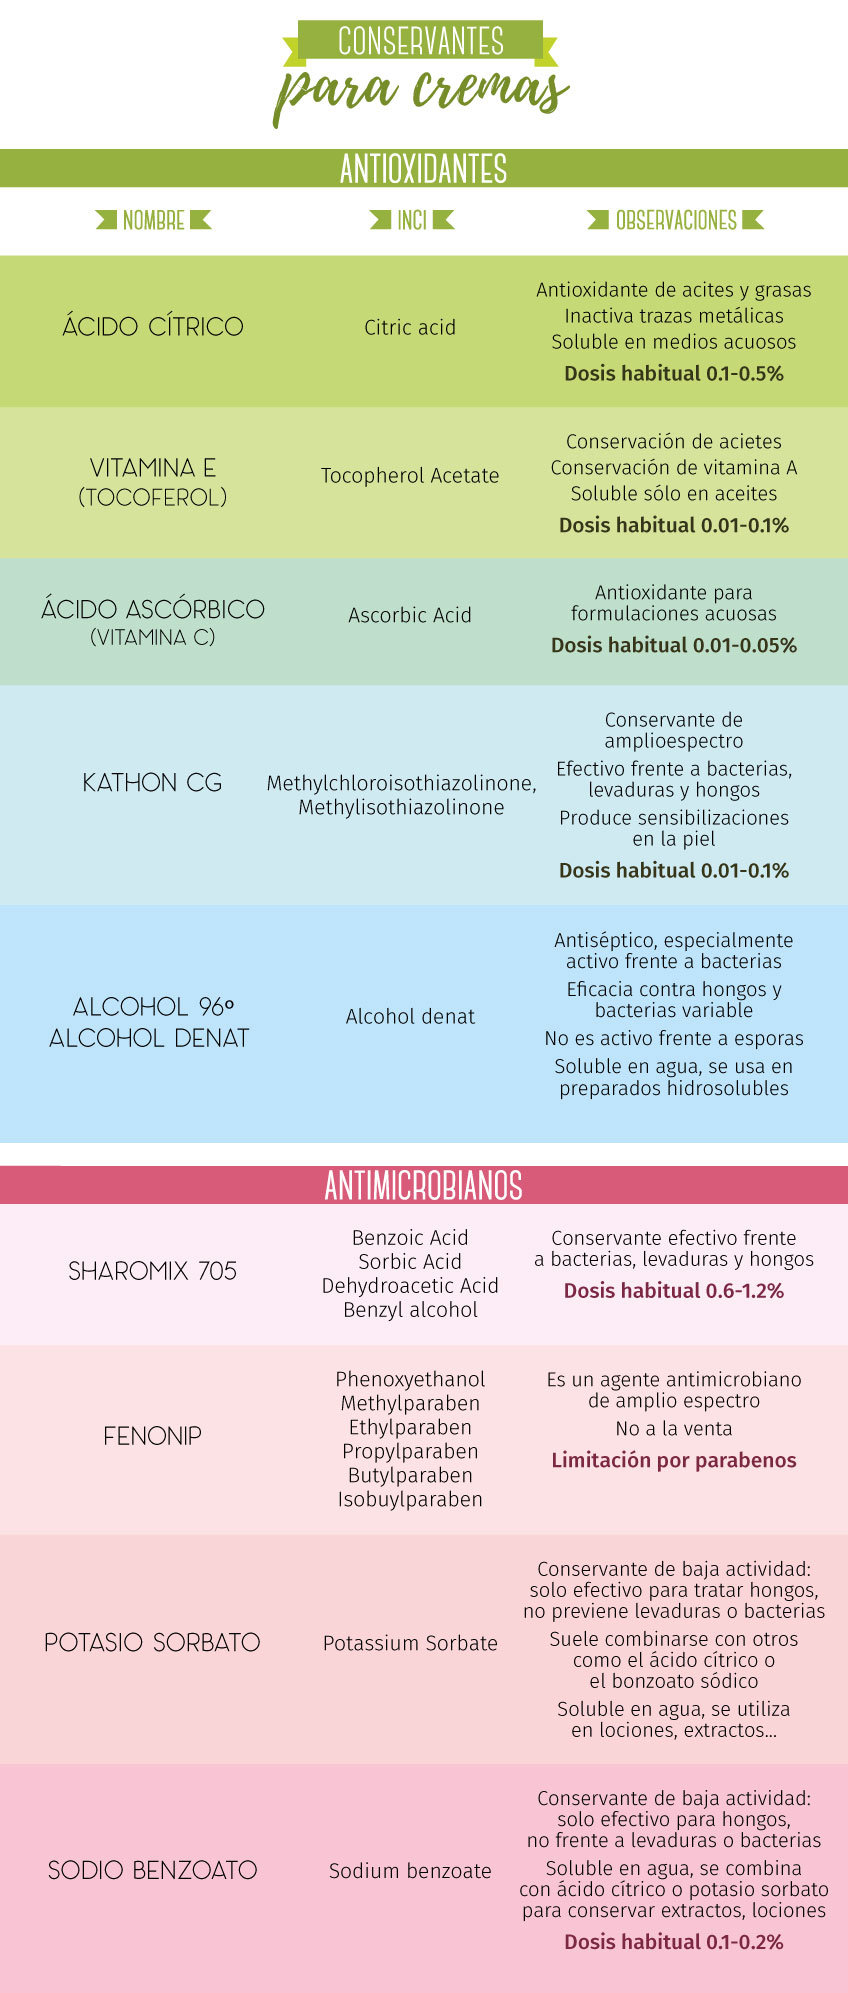 Tabla de conservantes para hacer Cremas Caseras según Gran Velada.